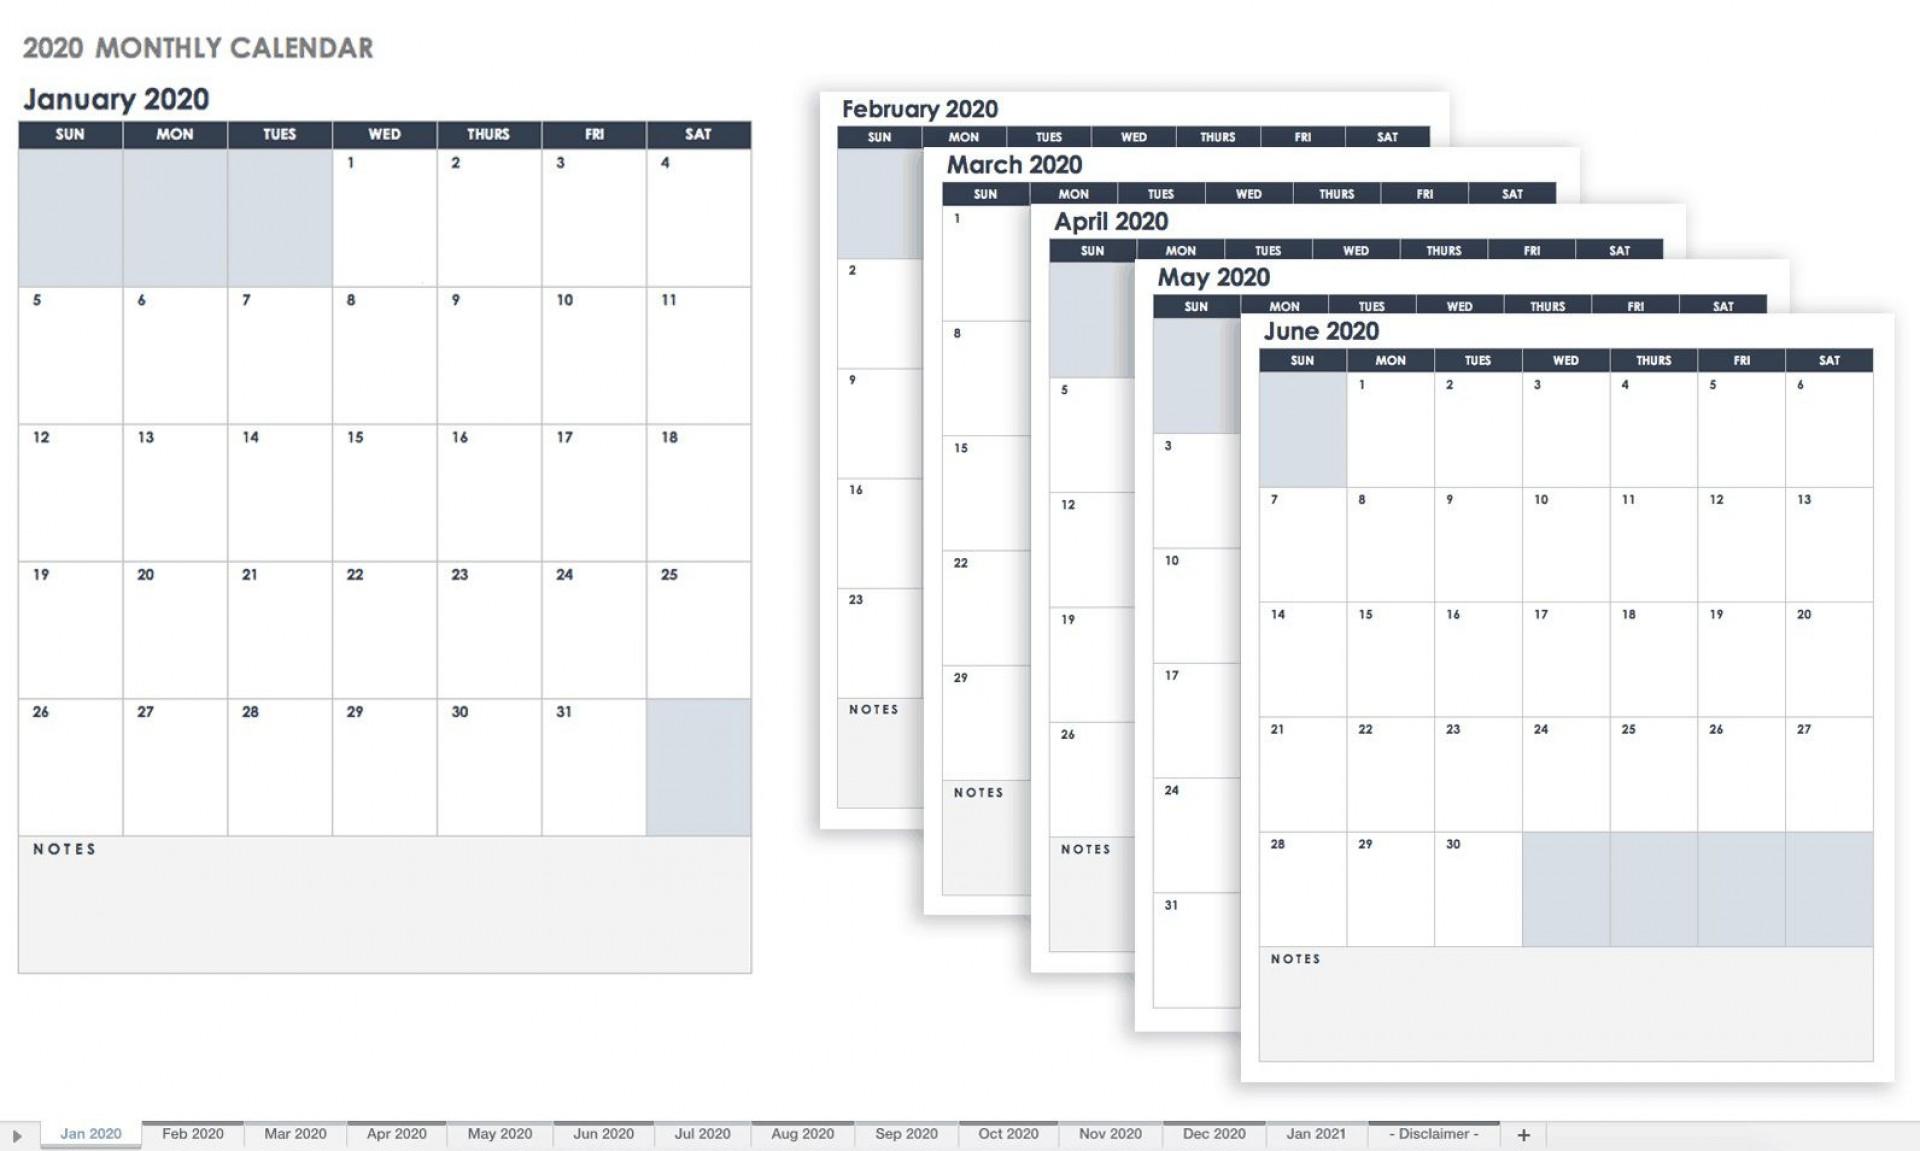 005 Impressive Calendar Template Google Doc High Resolution  Docs Editable Two Week 2019-201920